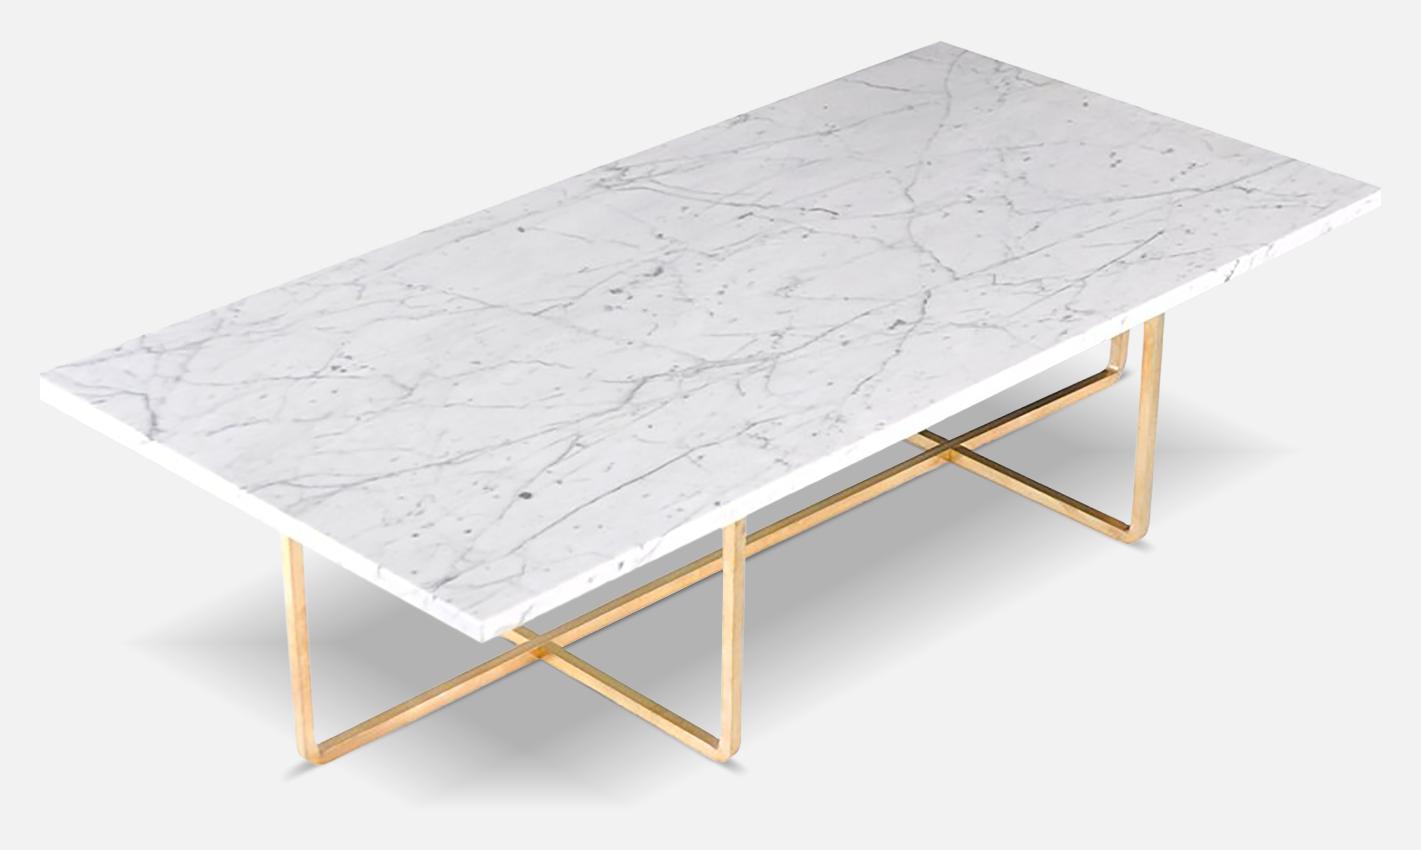 Underbar Ninety Table Soffbord från OX Denmarq   Olsson & Gerthel AQ-58